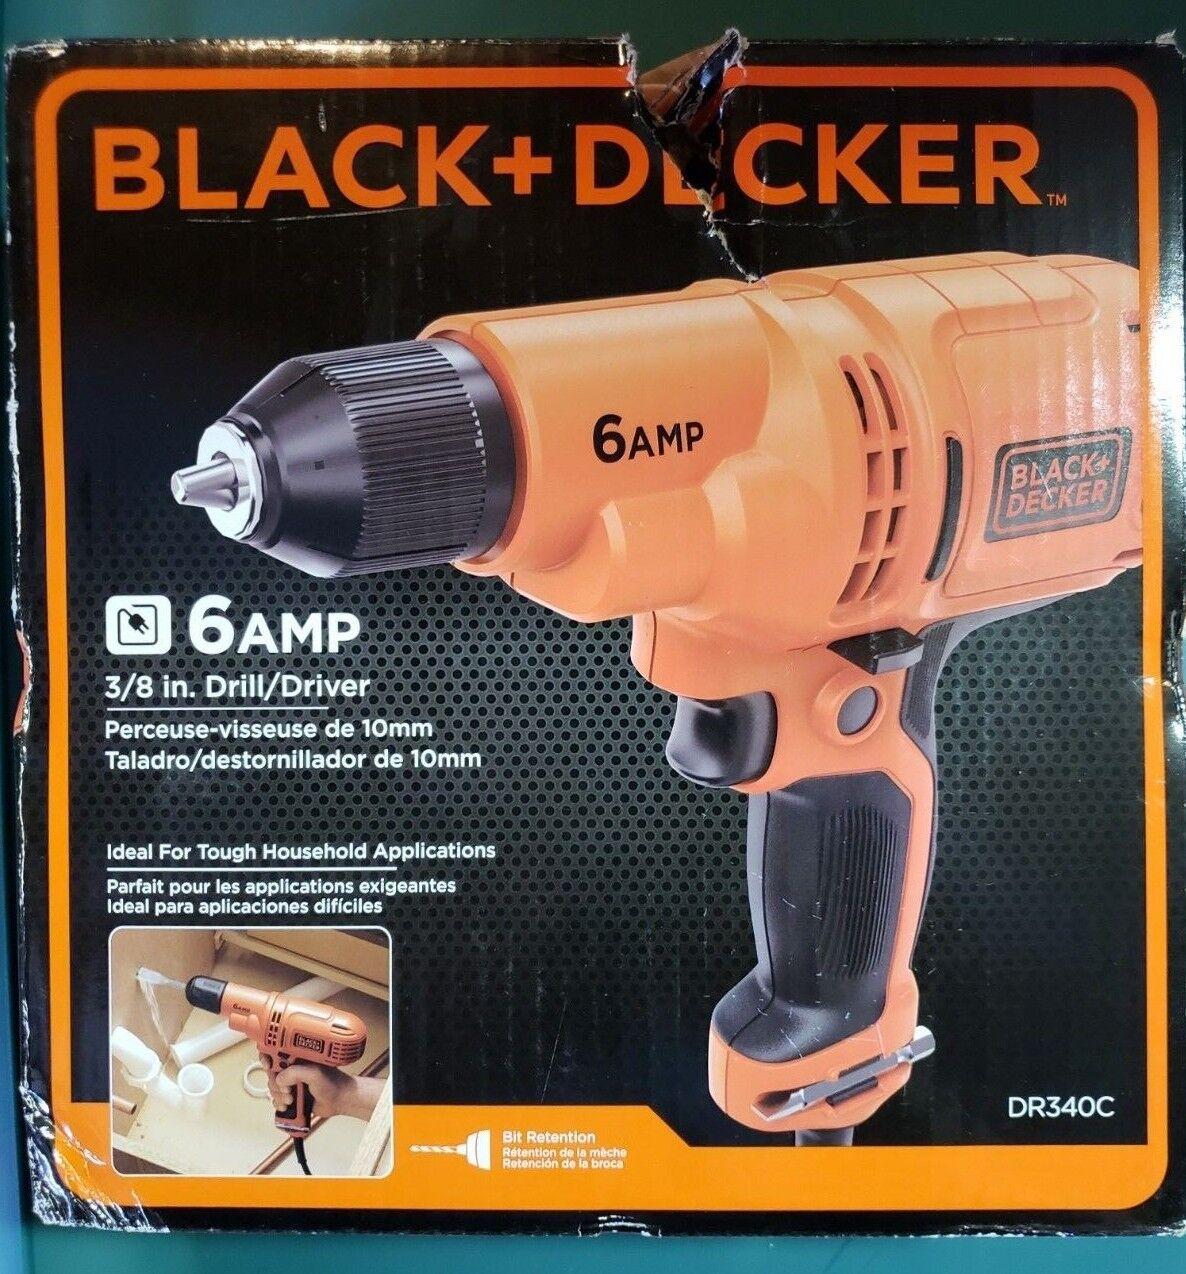 BLACK+DECKER DR340C  6.0 Amp 3//8 Drill//Driver with BLACK+DECKER 71-966 Drilling and Screwdriving Set 66-Piece Bit Set